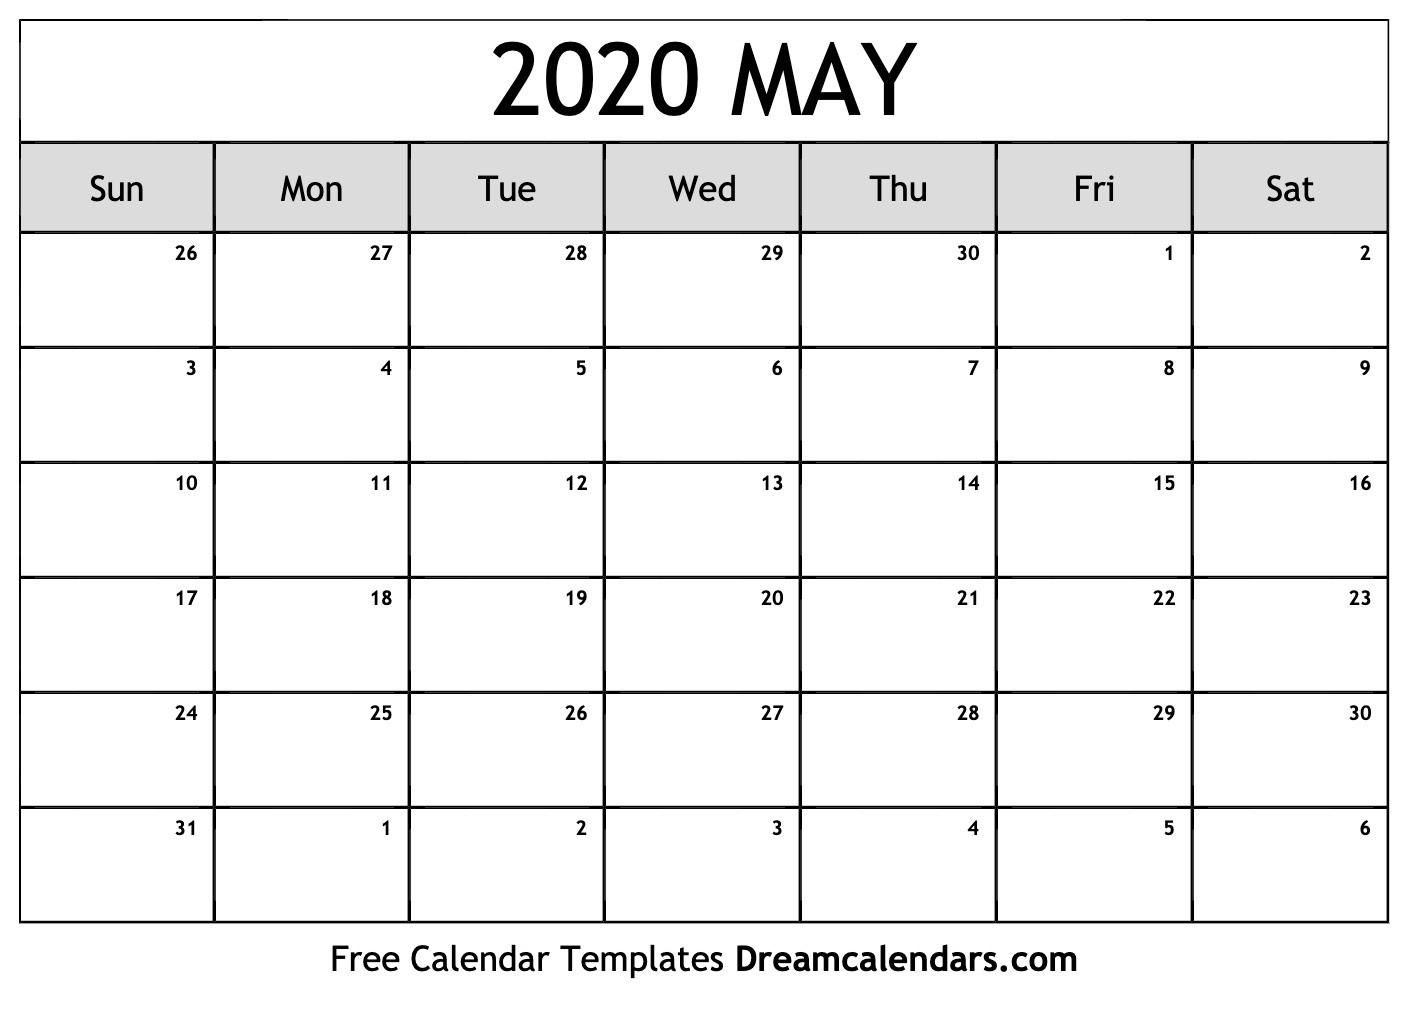 May 2020 Calendar | Free Blank Printable Templates  May 2020 Calendar Printable